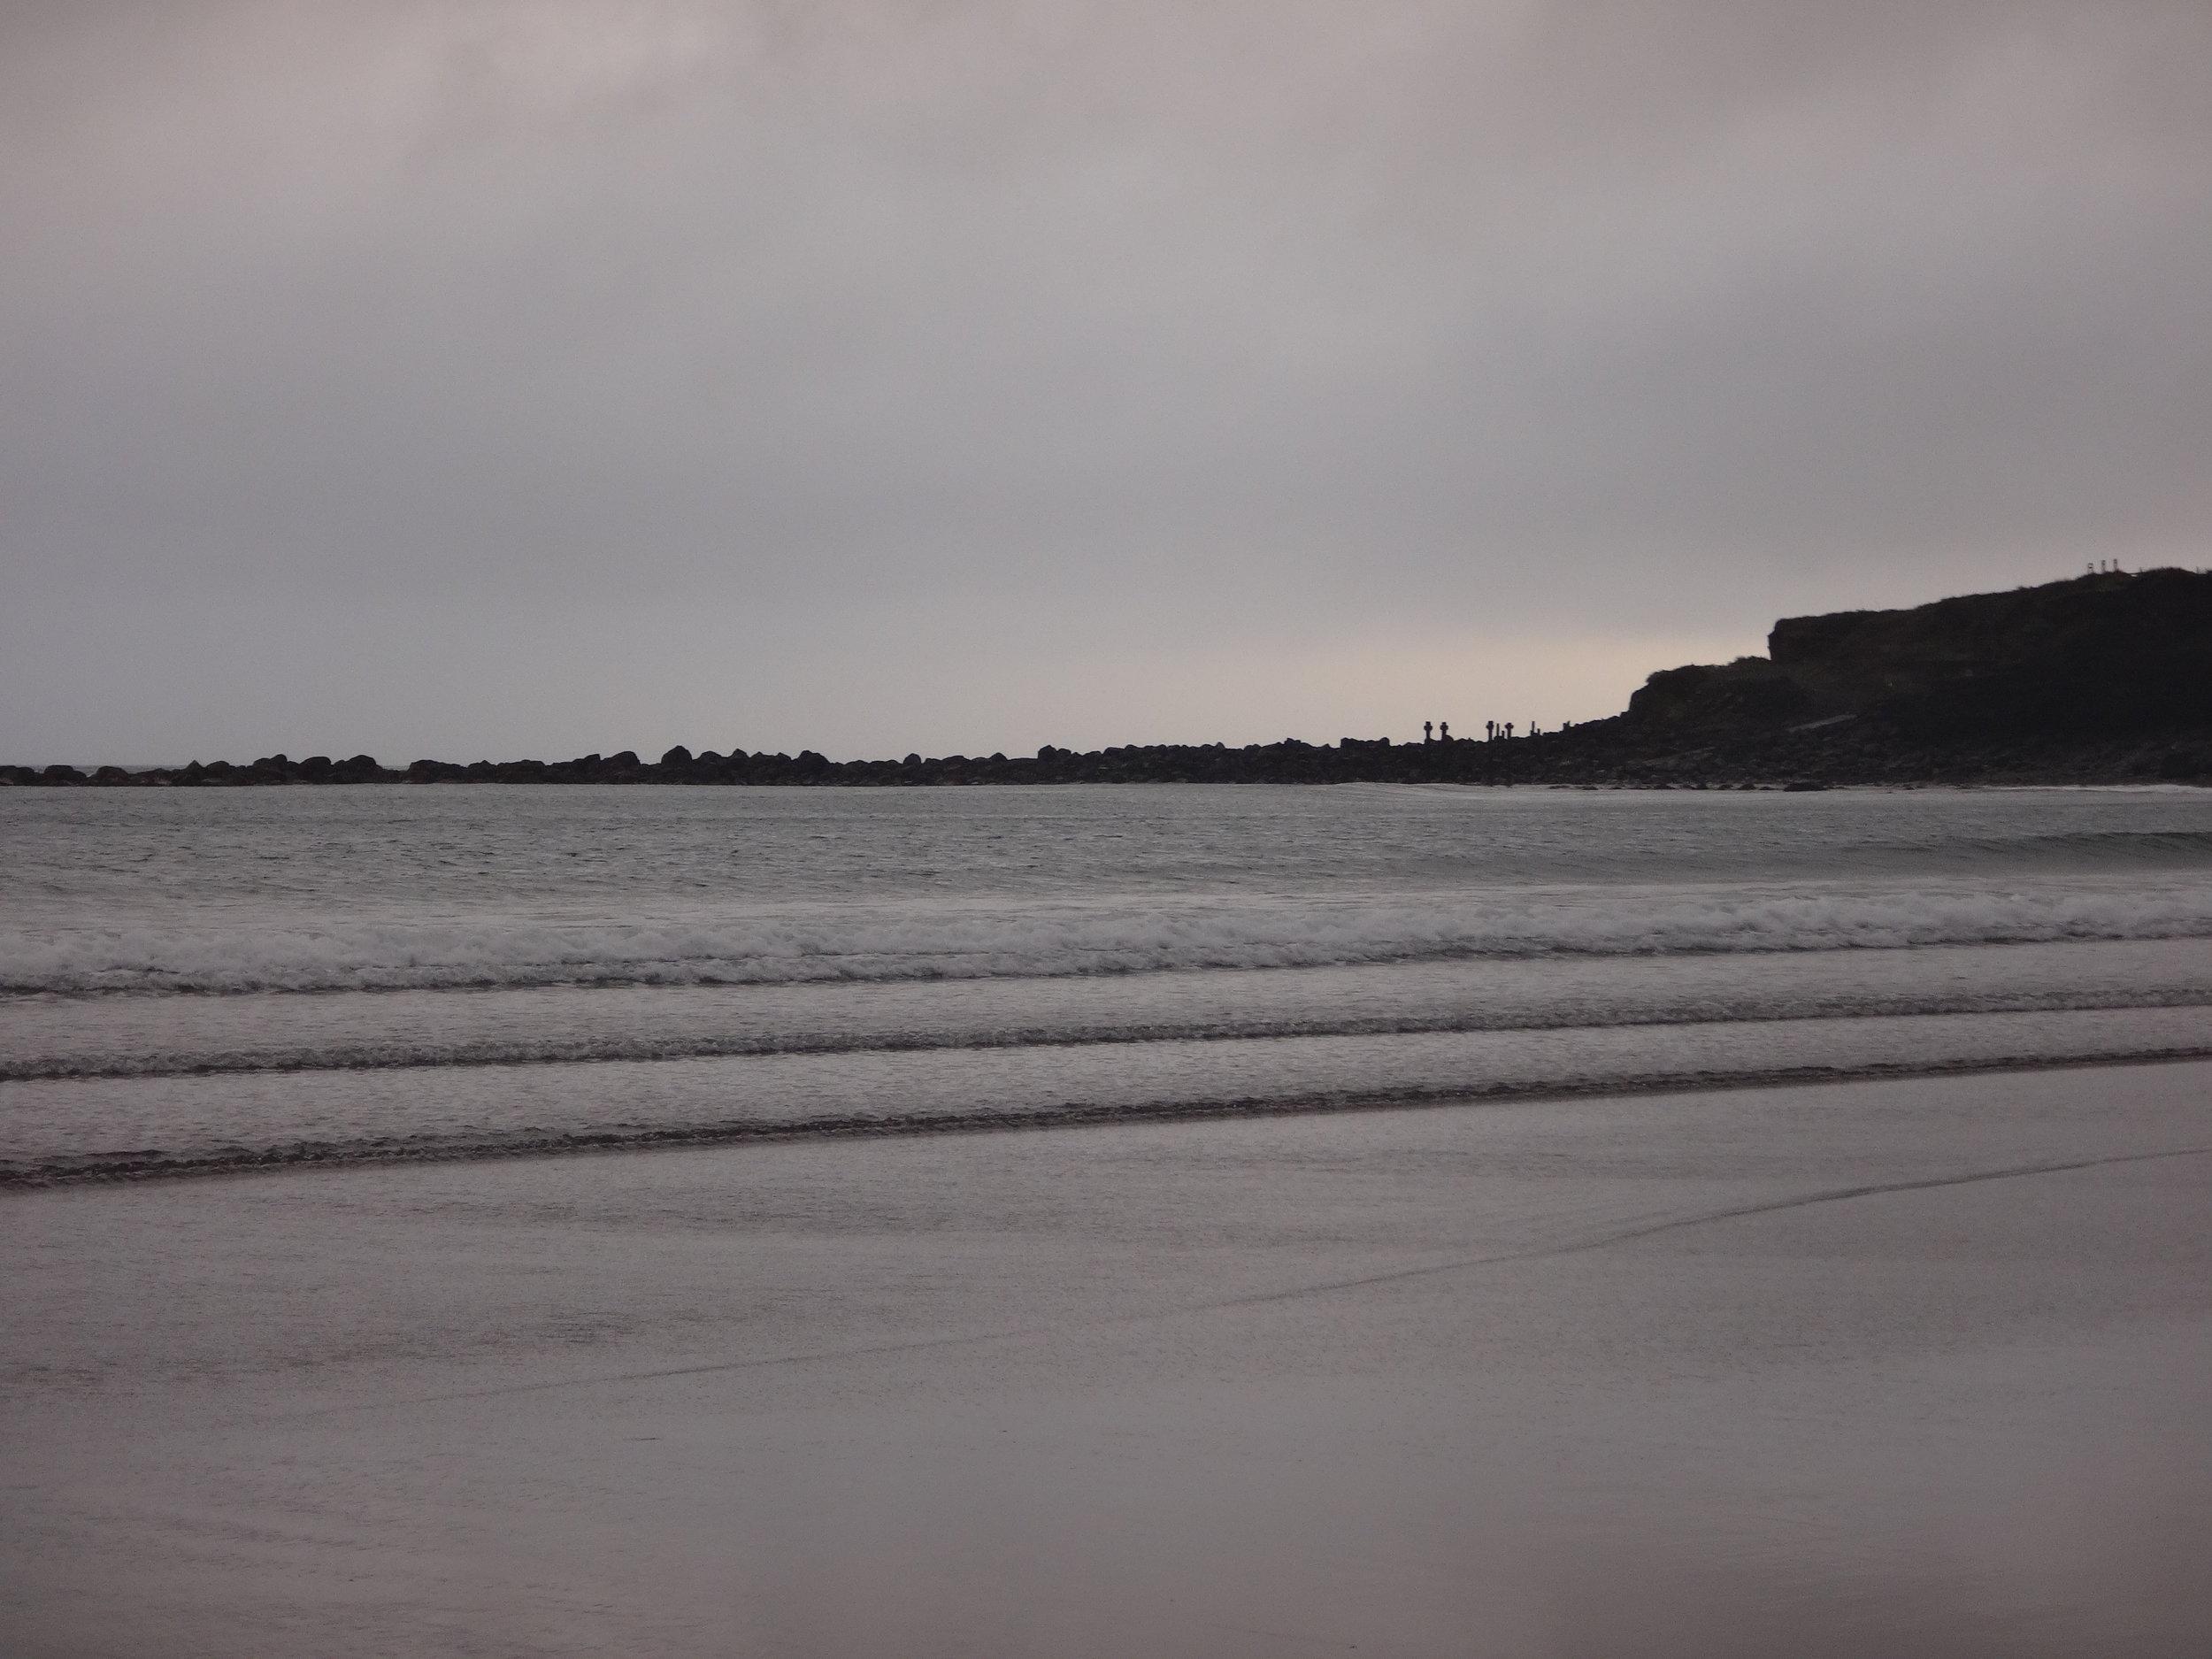 Opunake Beach. Grey, stormy clouds on a grey evening.